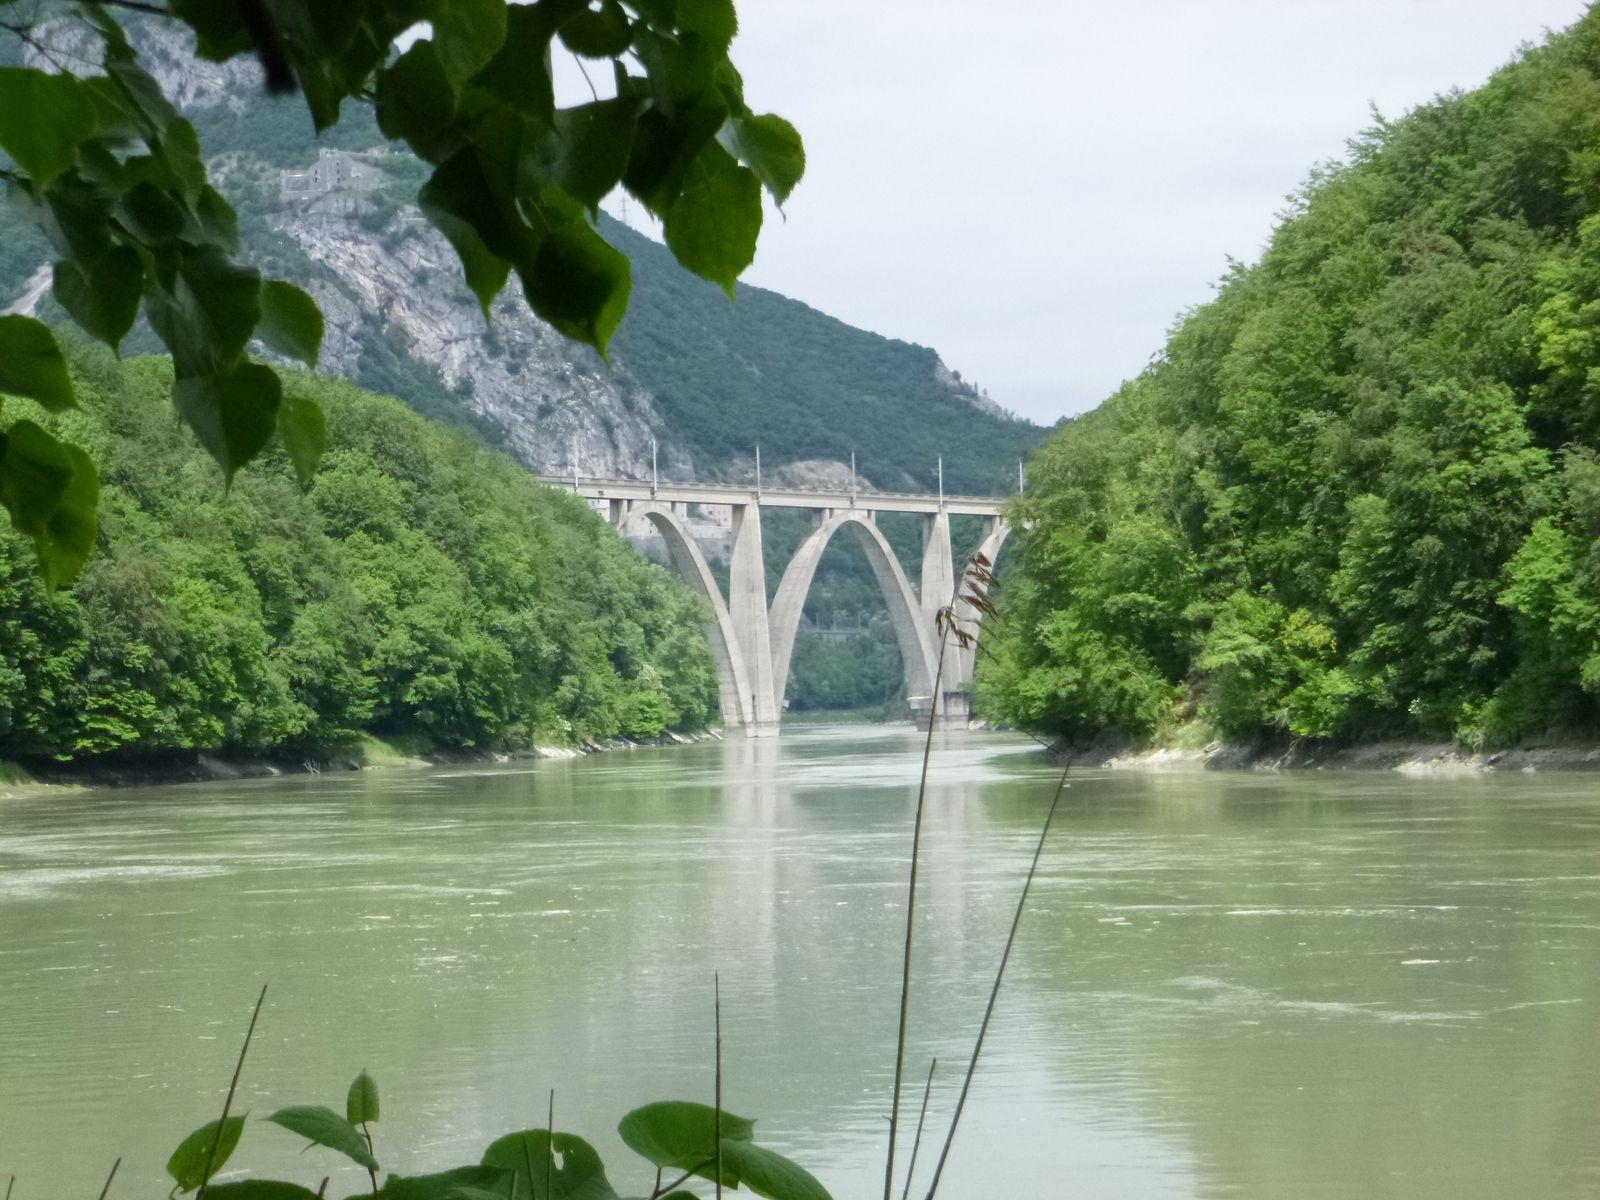 Le Viaduc de Longeray